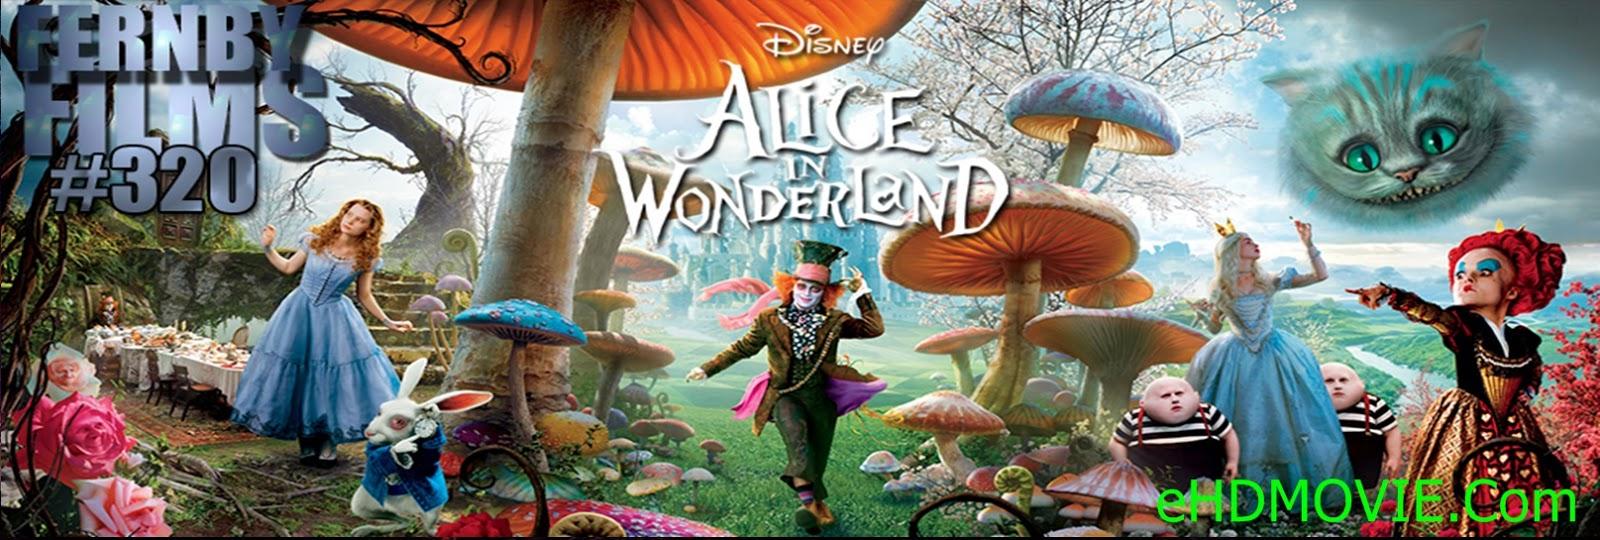 Alice In Wonderland 2010 Full Movie English 720p - 480p ORG BRRip 400MB - 900MB ESubs Free Download